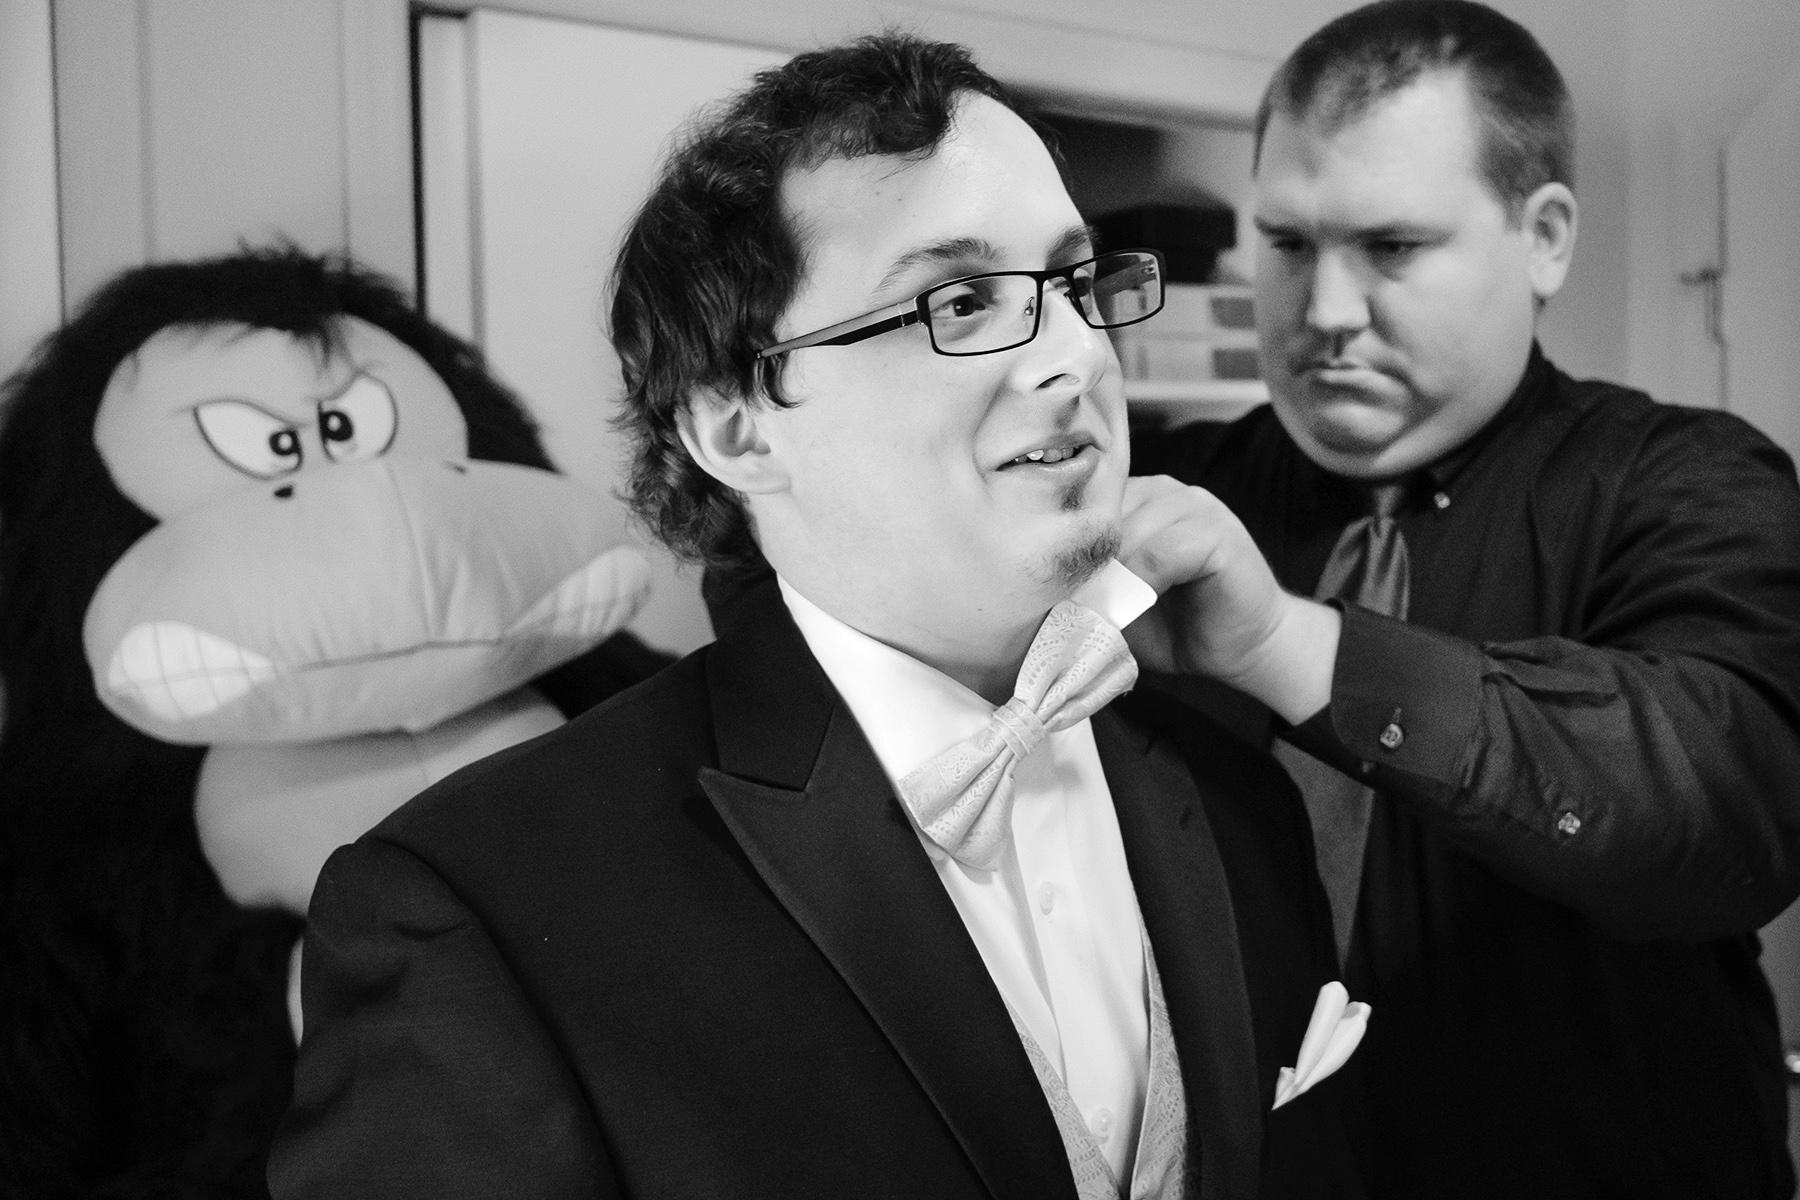 Tucker, Georgia Photographer - Beautiful Backyard Weddings | The best man adjusts his bow tie